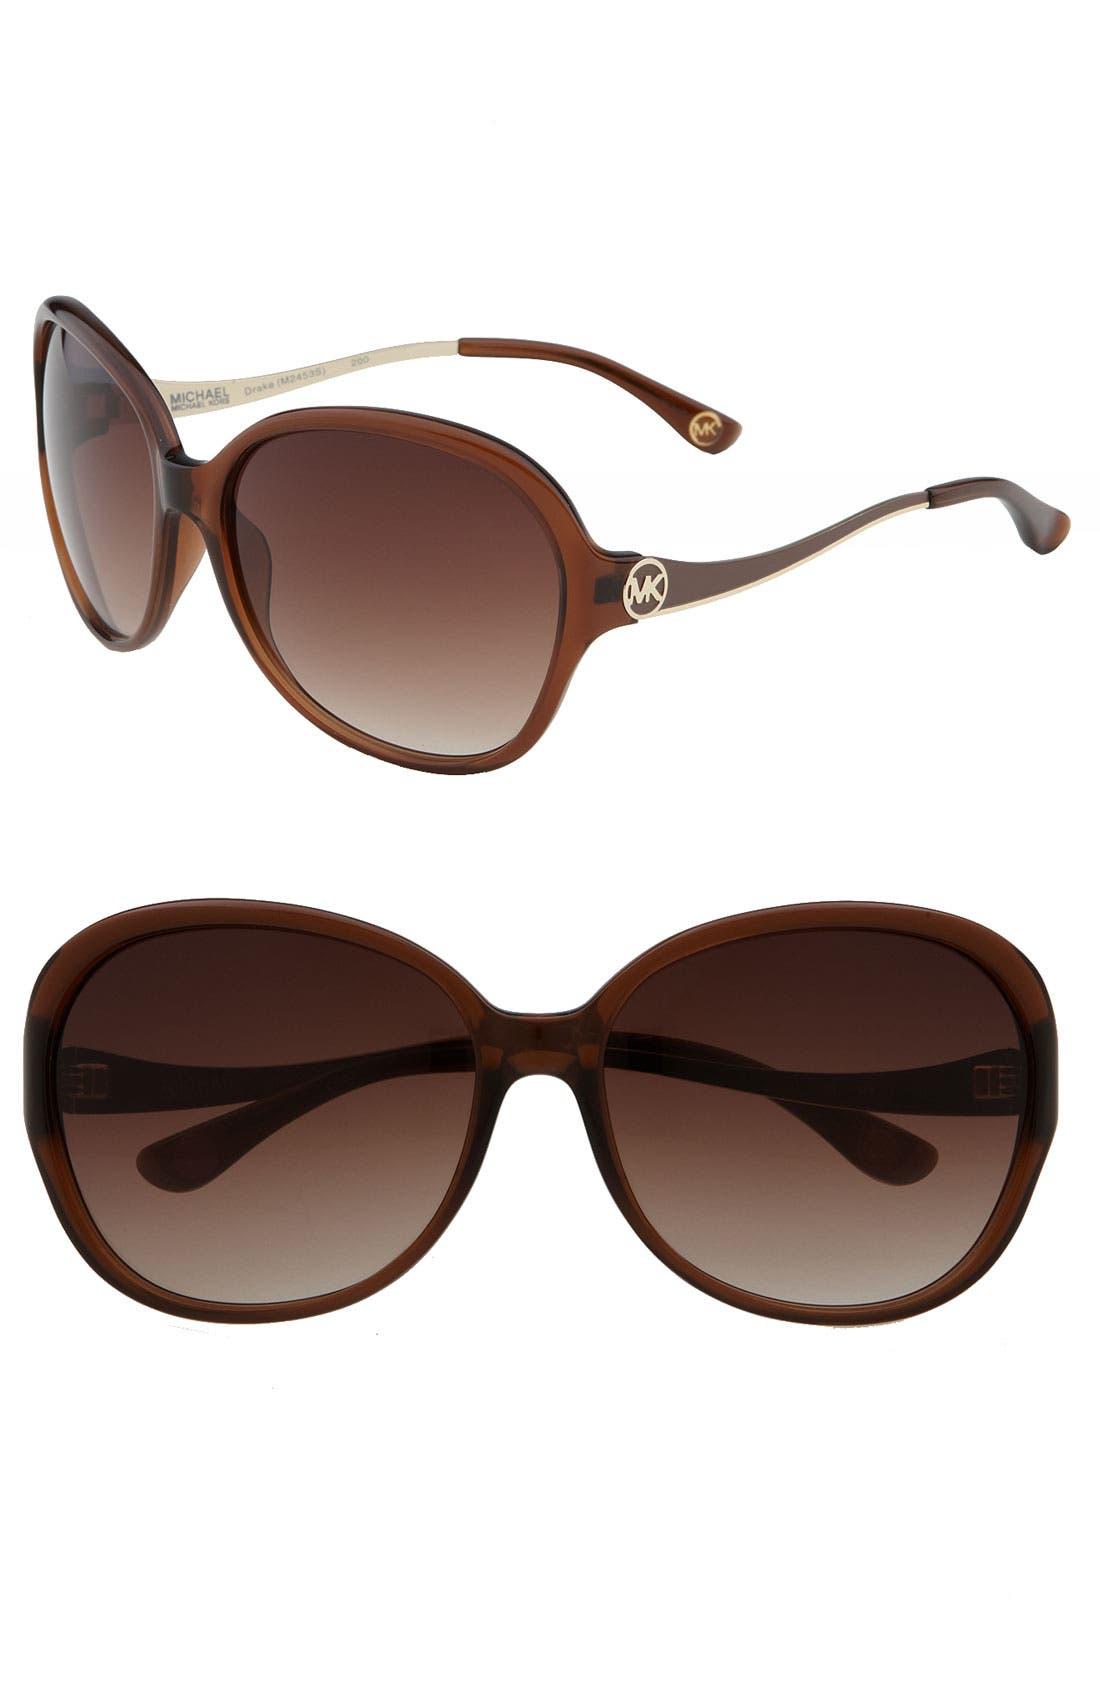 Main Image - MICHAEL Michael Kors 'Drake' Oversized Round Sunglasses